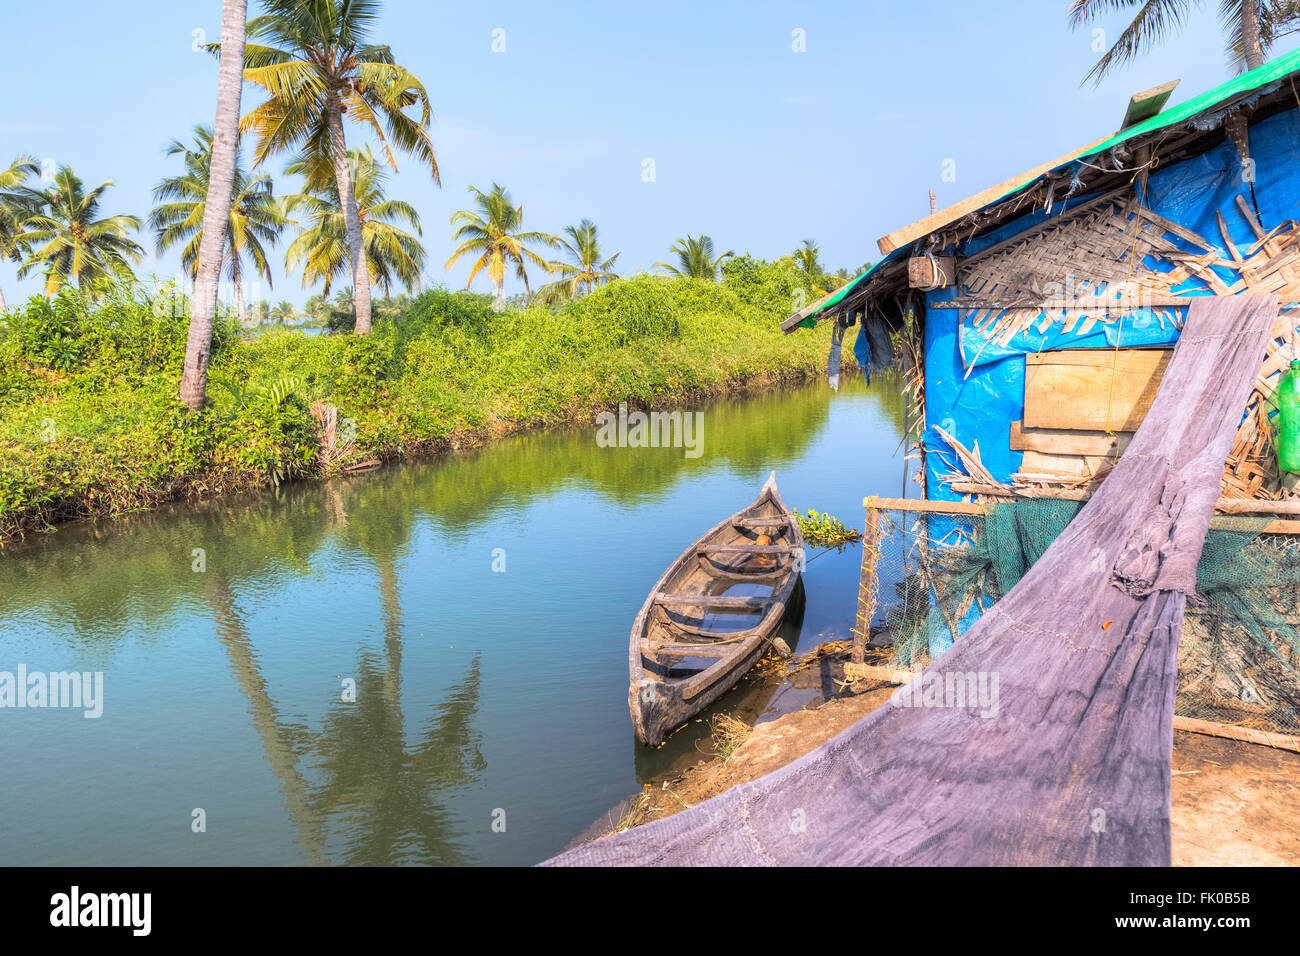 fisherman's hut in Kochi, Kerala, India, Asia - Stock Image